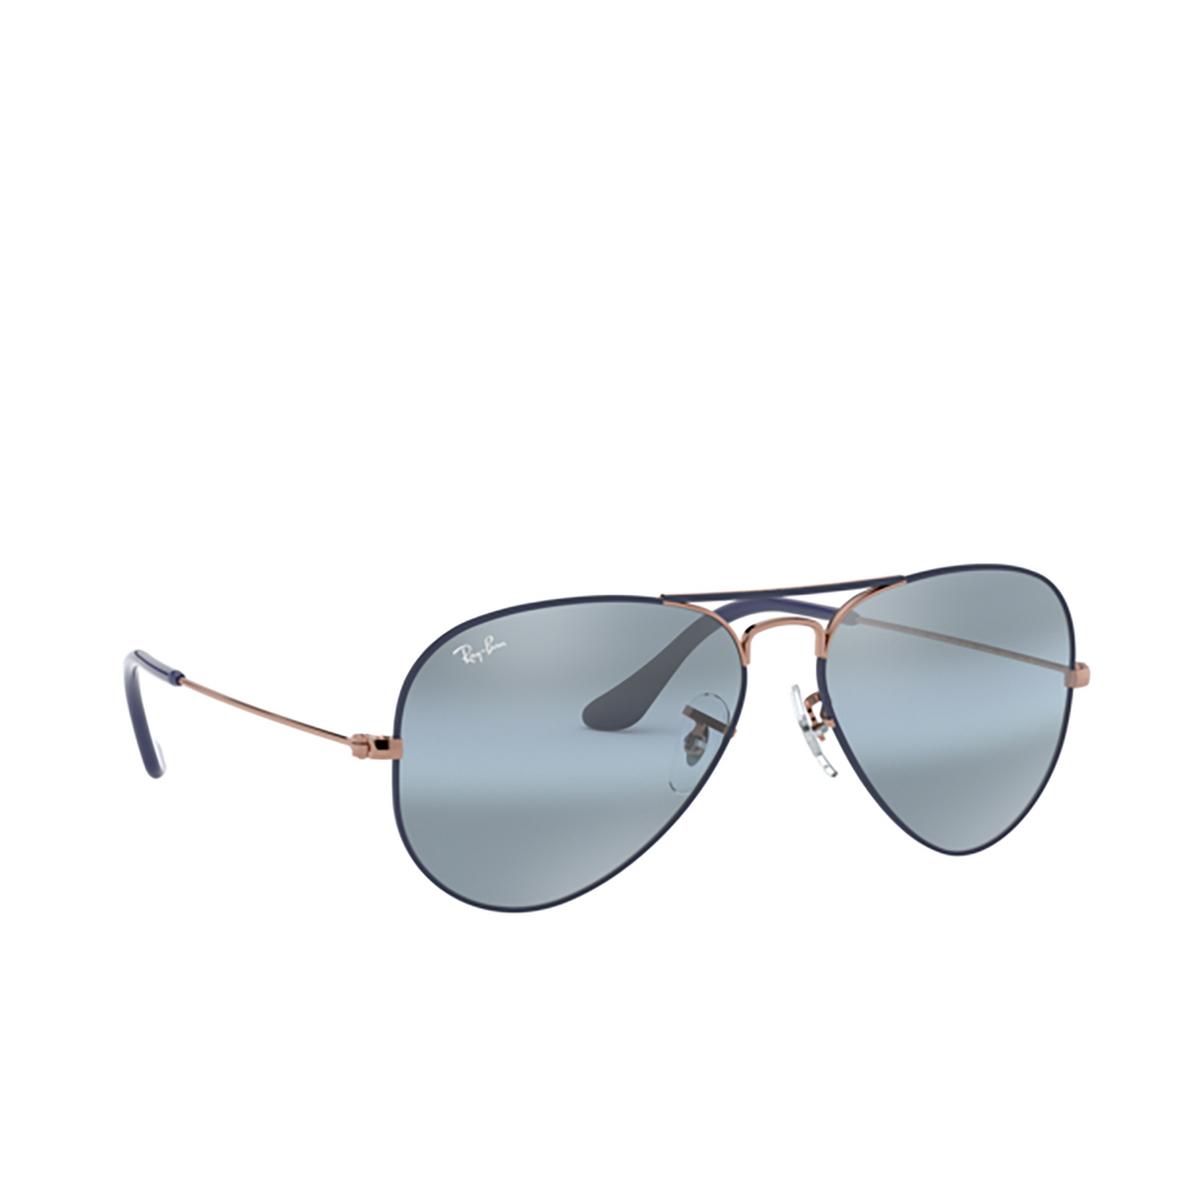 Ray-Ban® Aviator Sunglasses: Aviator Large Metal RB3025 color Matte Dark Blue On Copper 9156AJ.